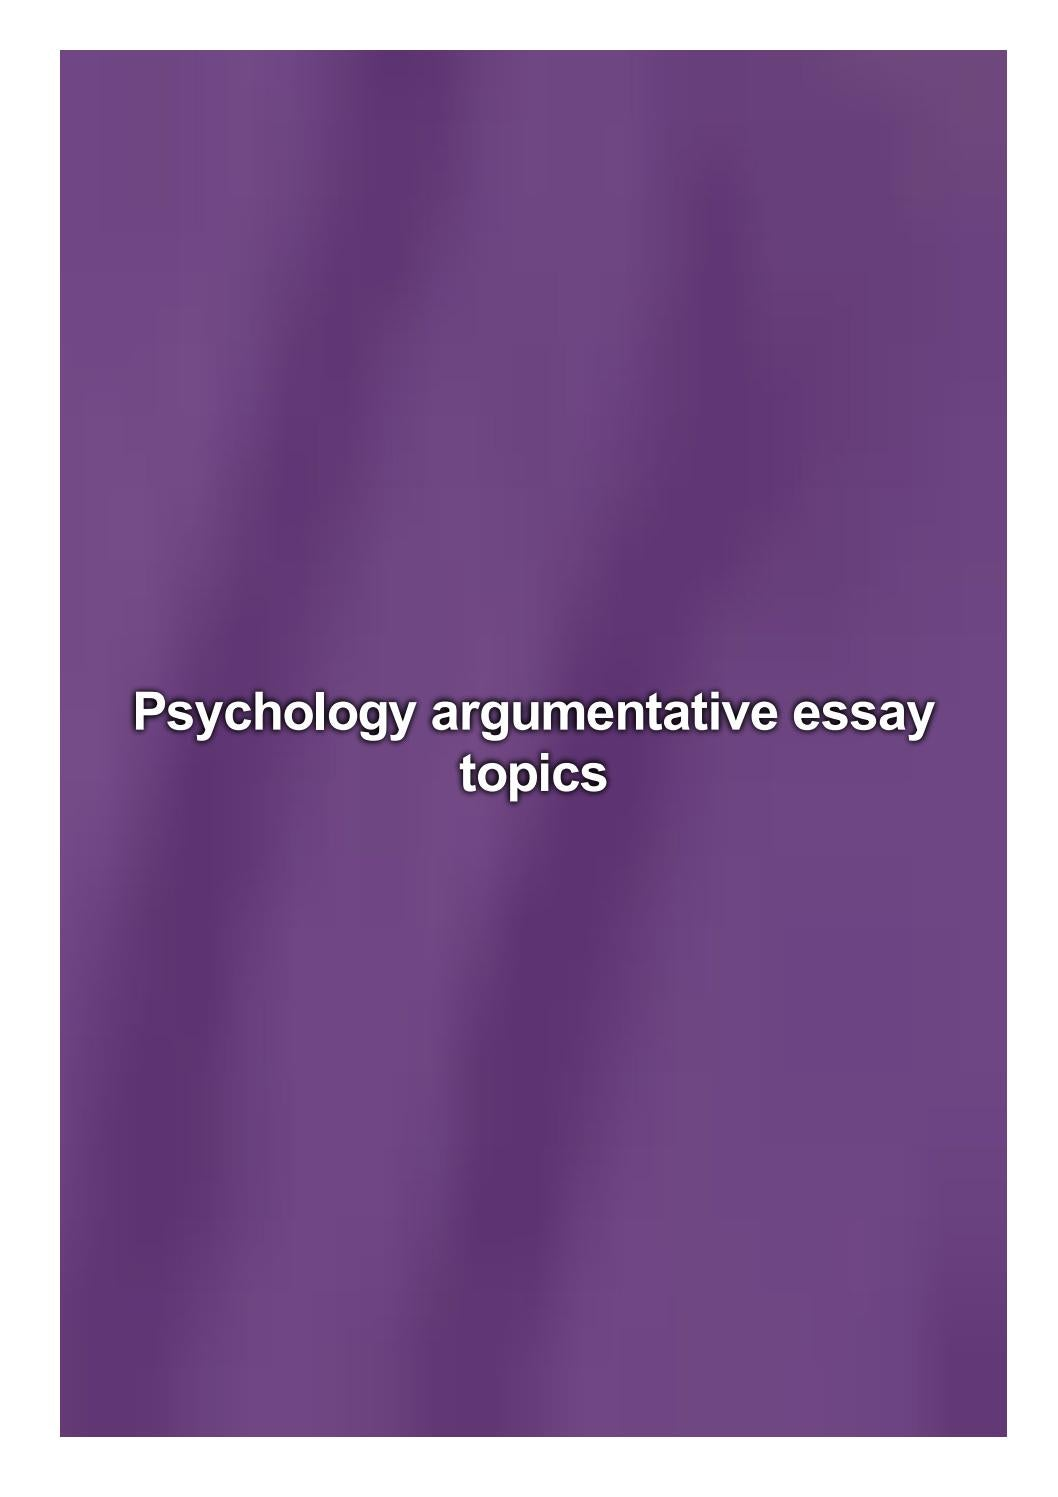 Psychology argumentative essay bibliography help